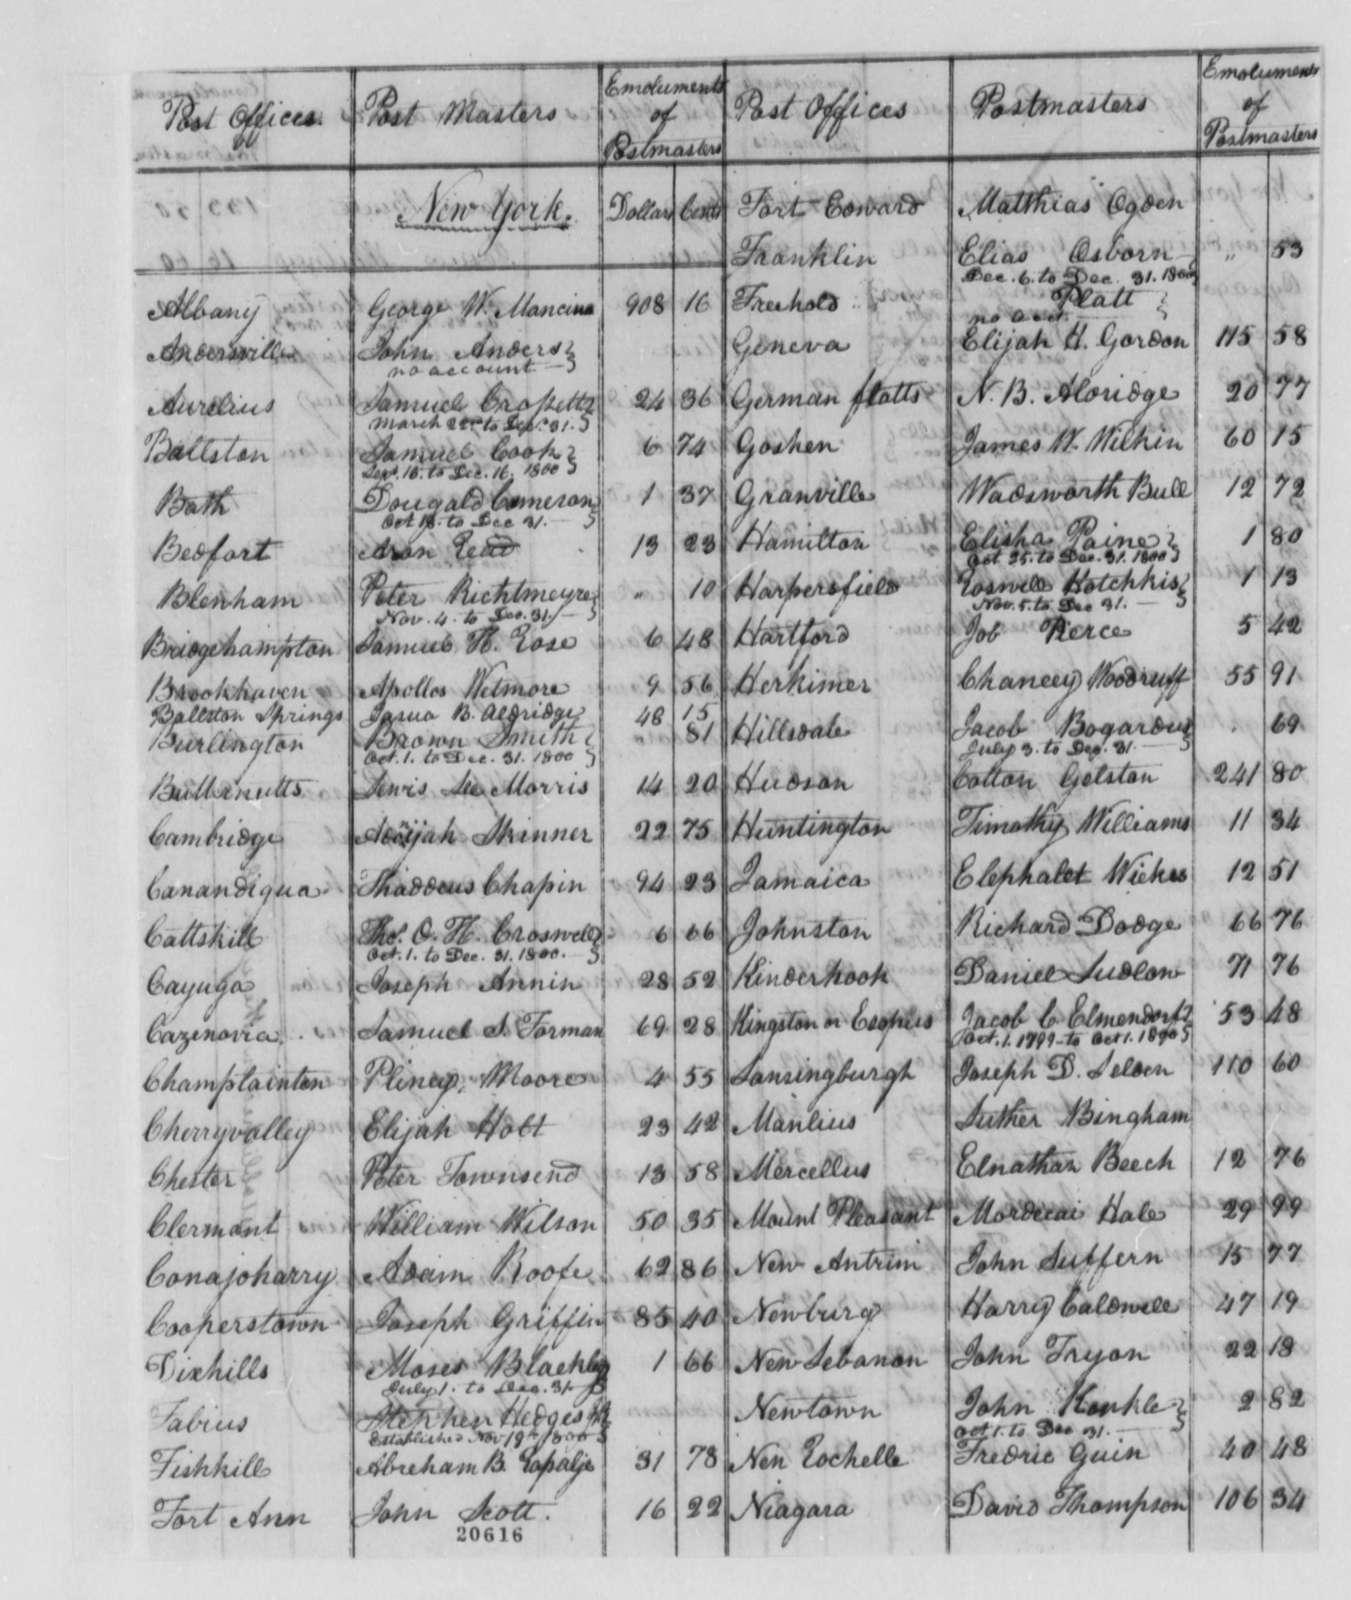 Gideon Granger to Thomas Jefferson, January 5, 1802, Postmaster List